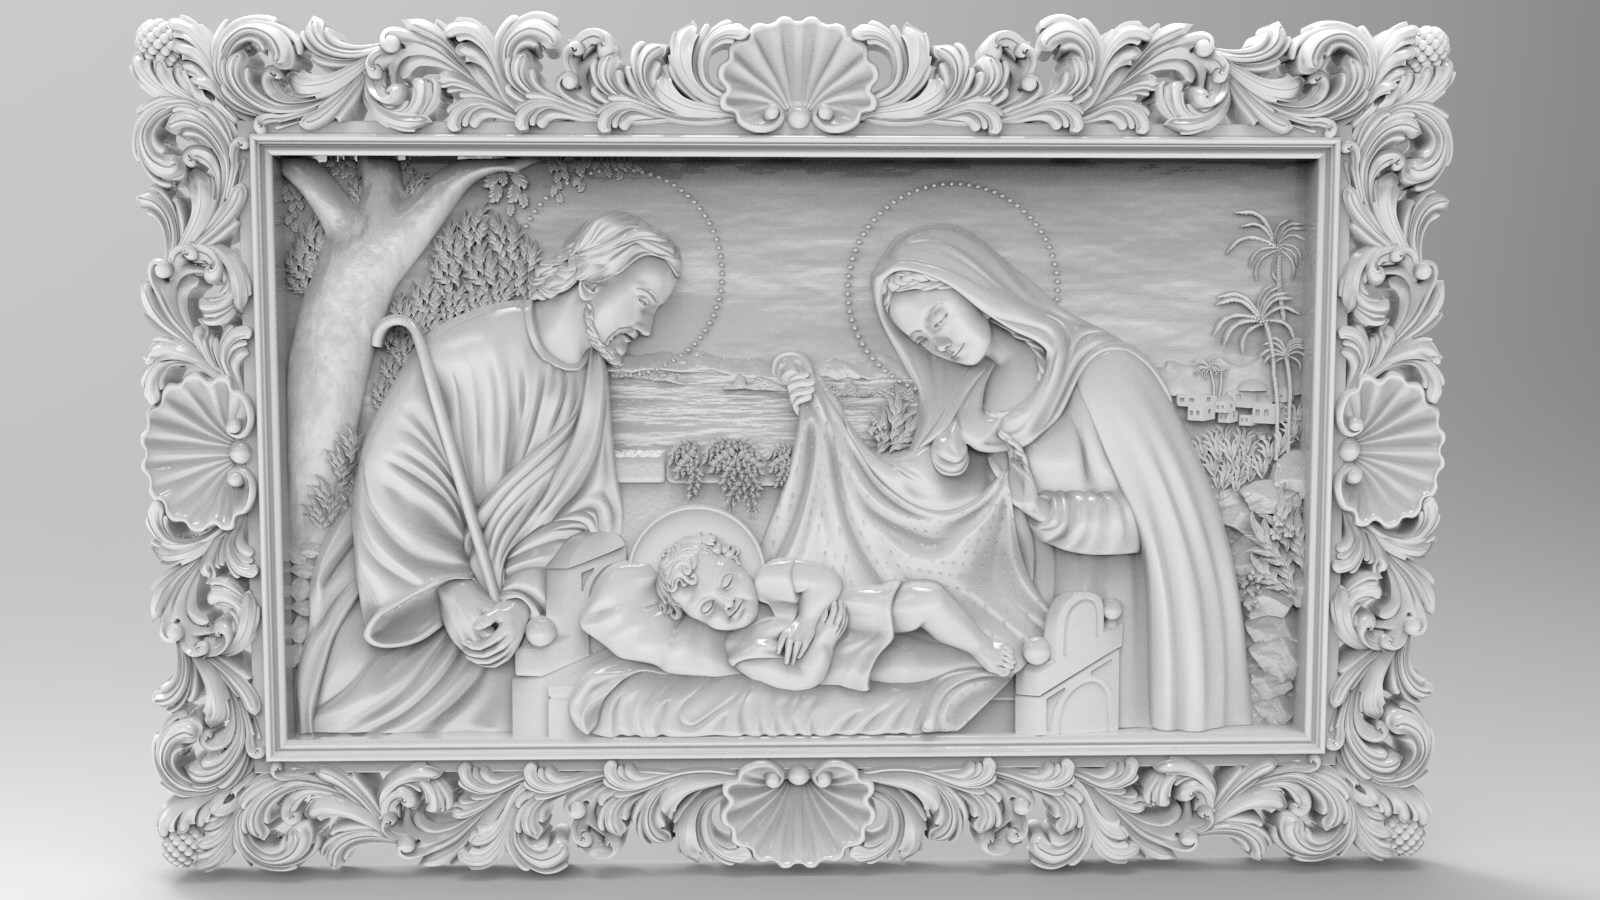 68_BirthOFJRK.png Download free STL file Birth of jesus wall art 3d stl models for artcam and aspire • 3D printing design, Isu45-3dmodels